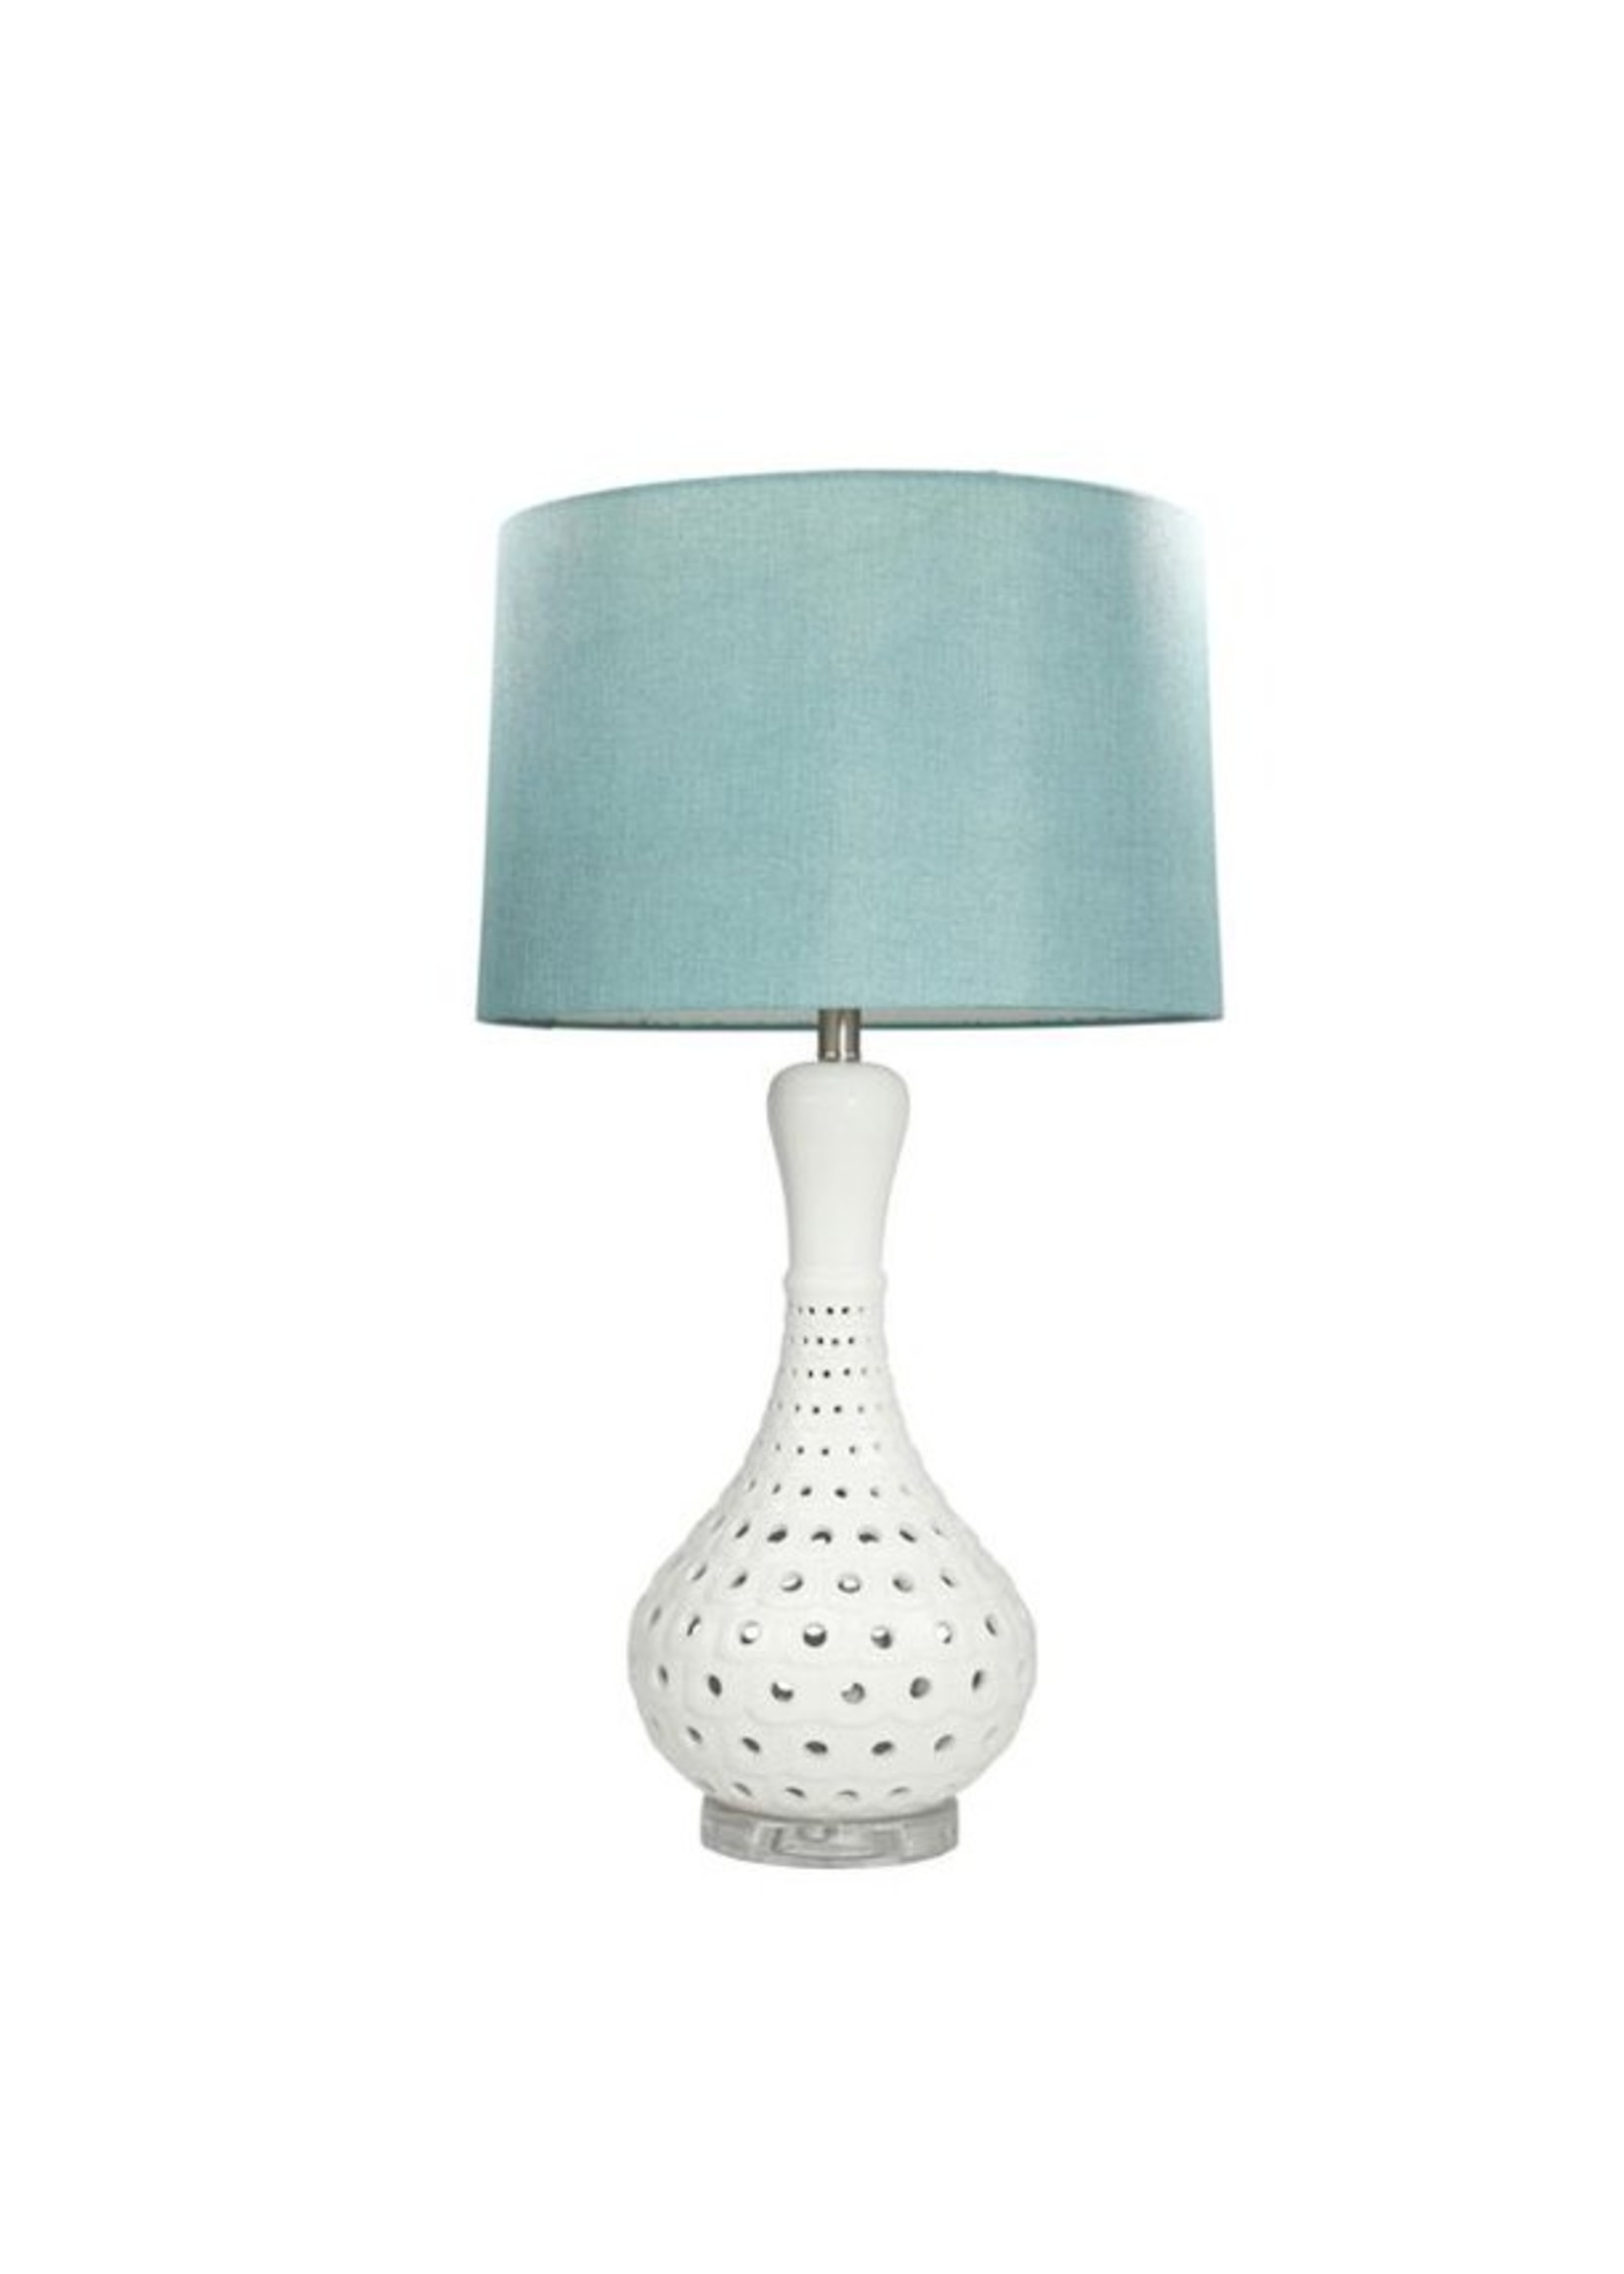 "Sagebrook Home SBH 31"" Ceramic Pierced Bottle Table Lamp White"